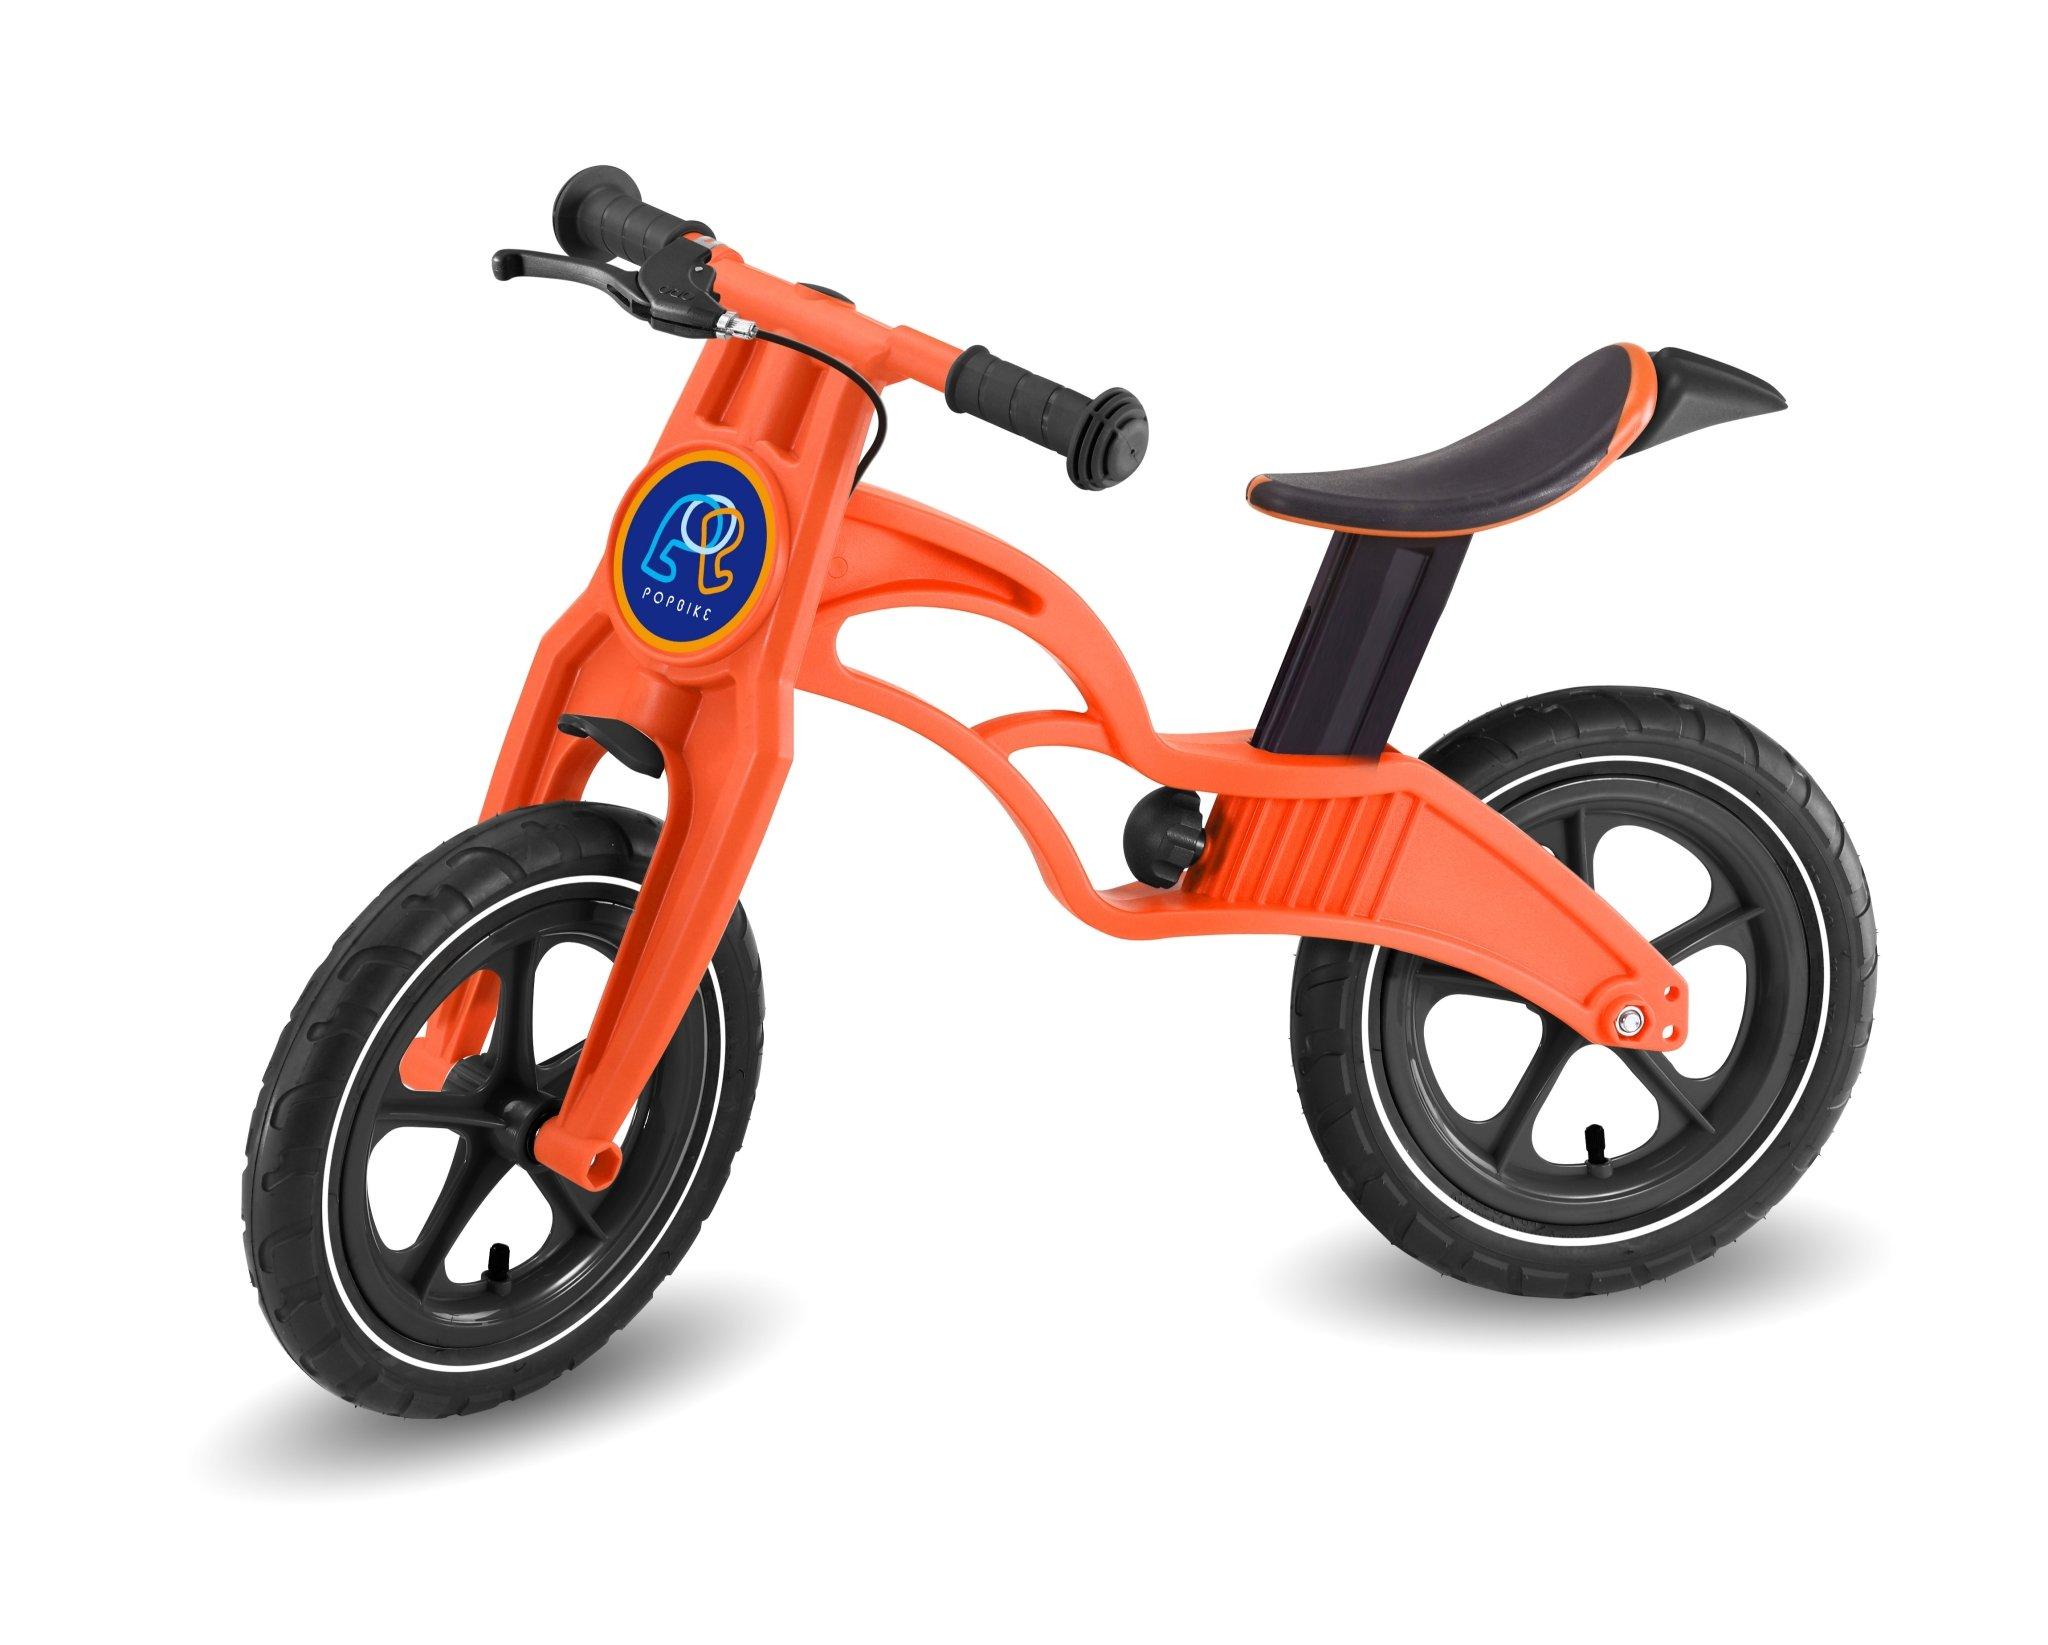 Pop Bike 兒童滑步車 / 平衡車 / 學步車 /  - 煞車版 氣胎 橘色 - 限時優惠好康折扣